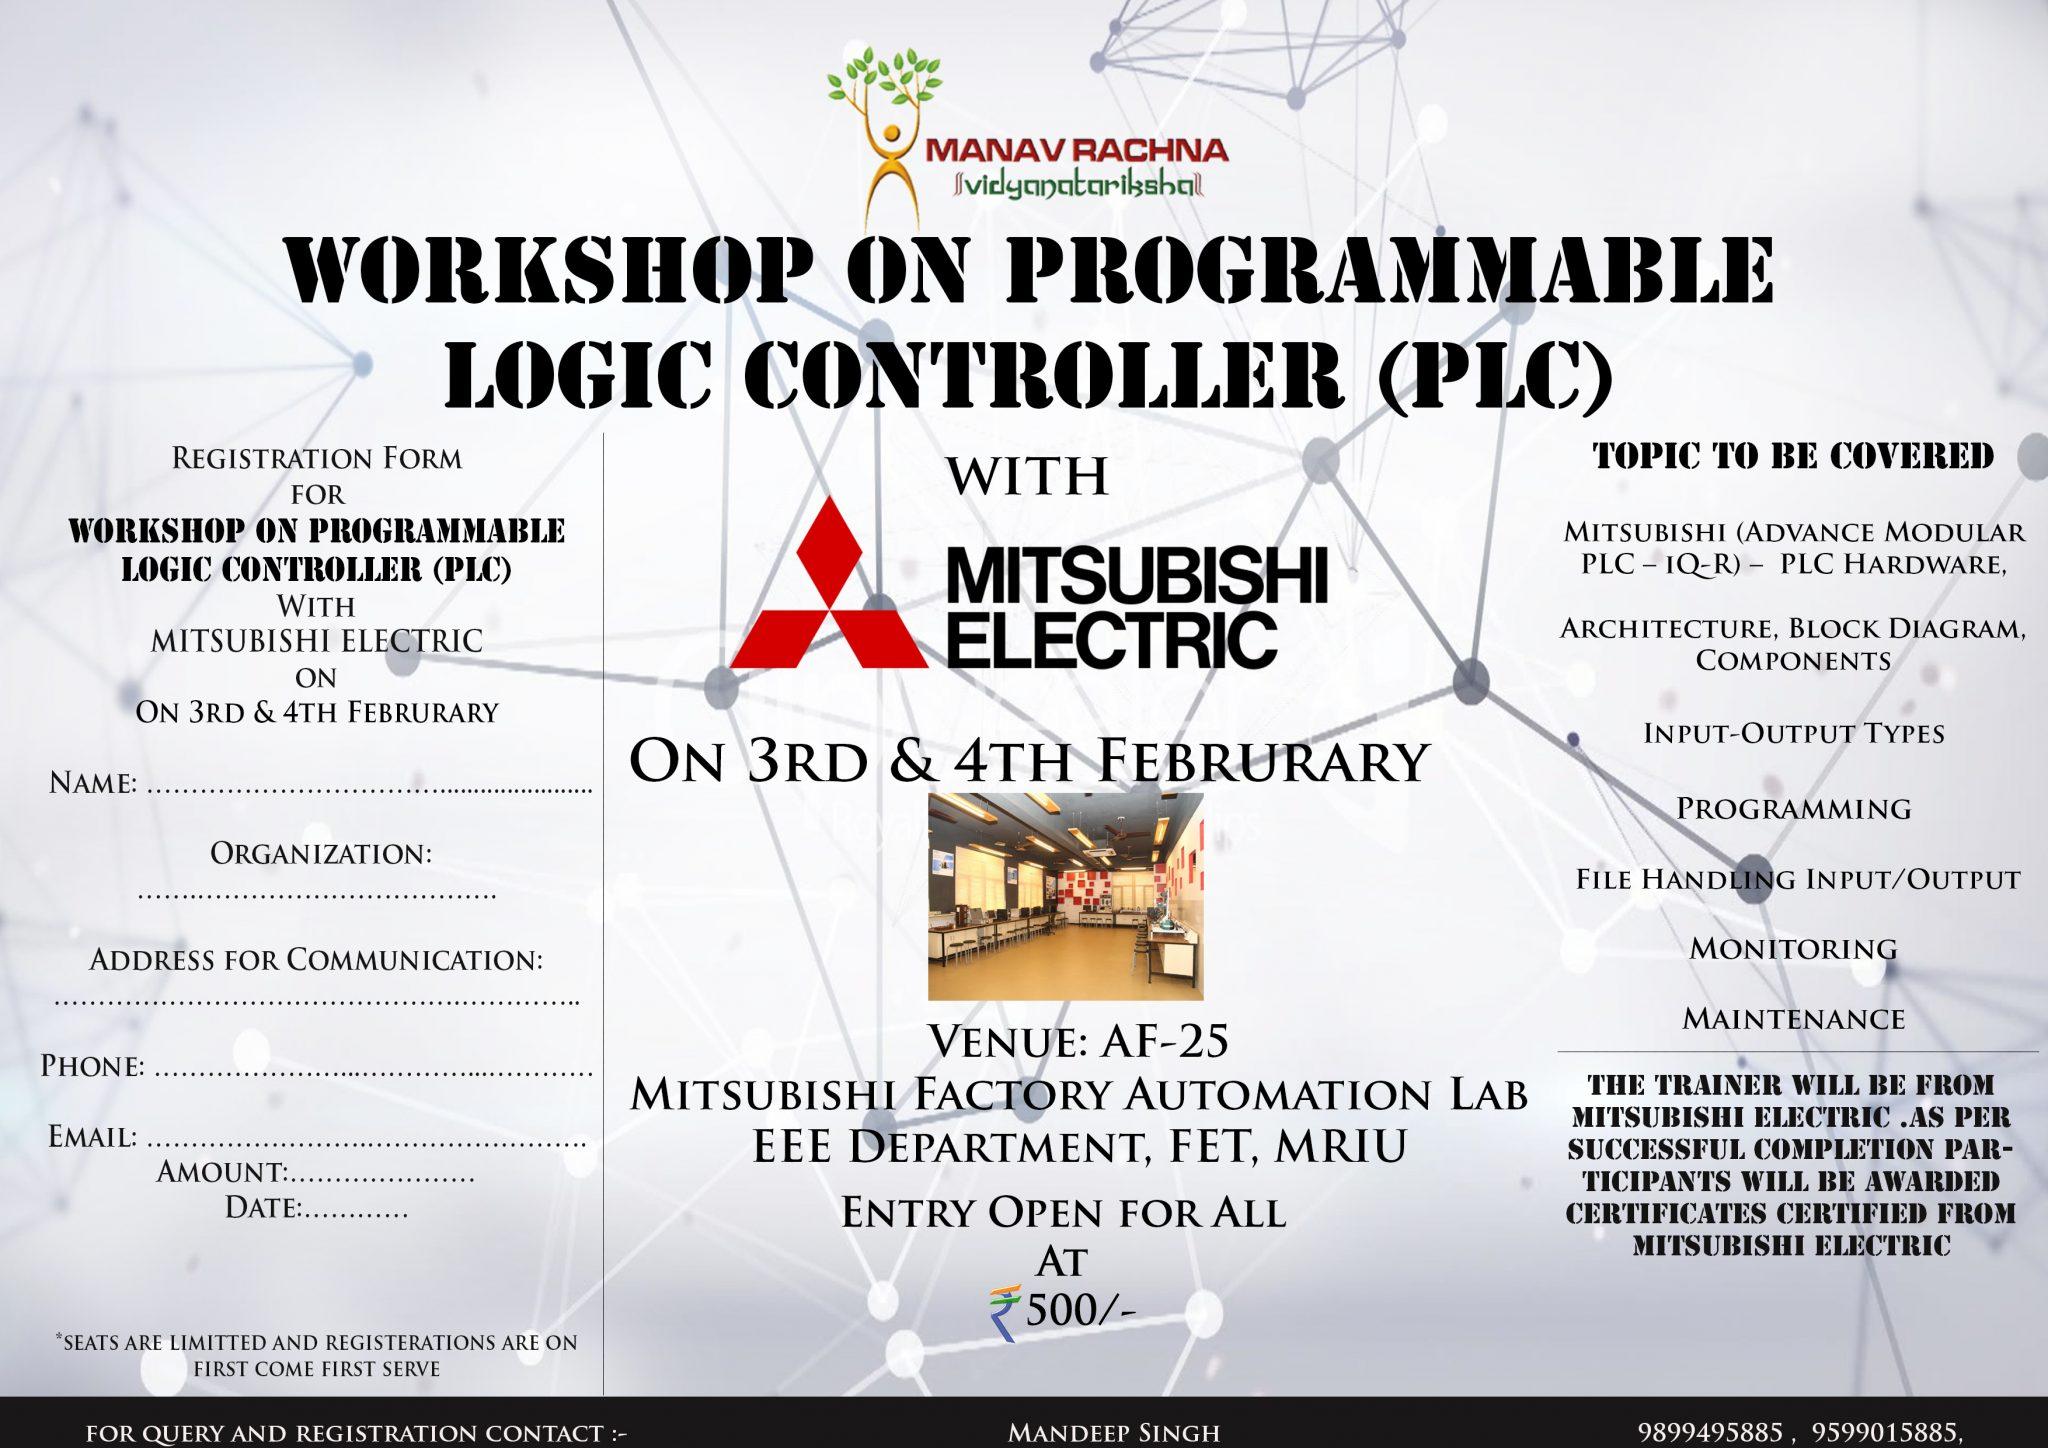 Workshop On Programmable Logic Controller Manav Rachna Vidyanatariksha Diagram Plc Click Here To View Download Registration Form